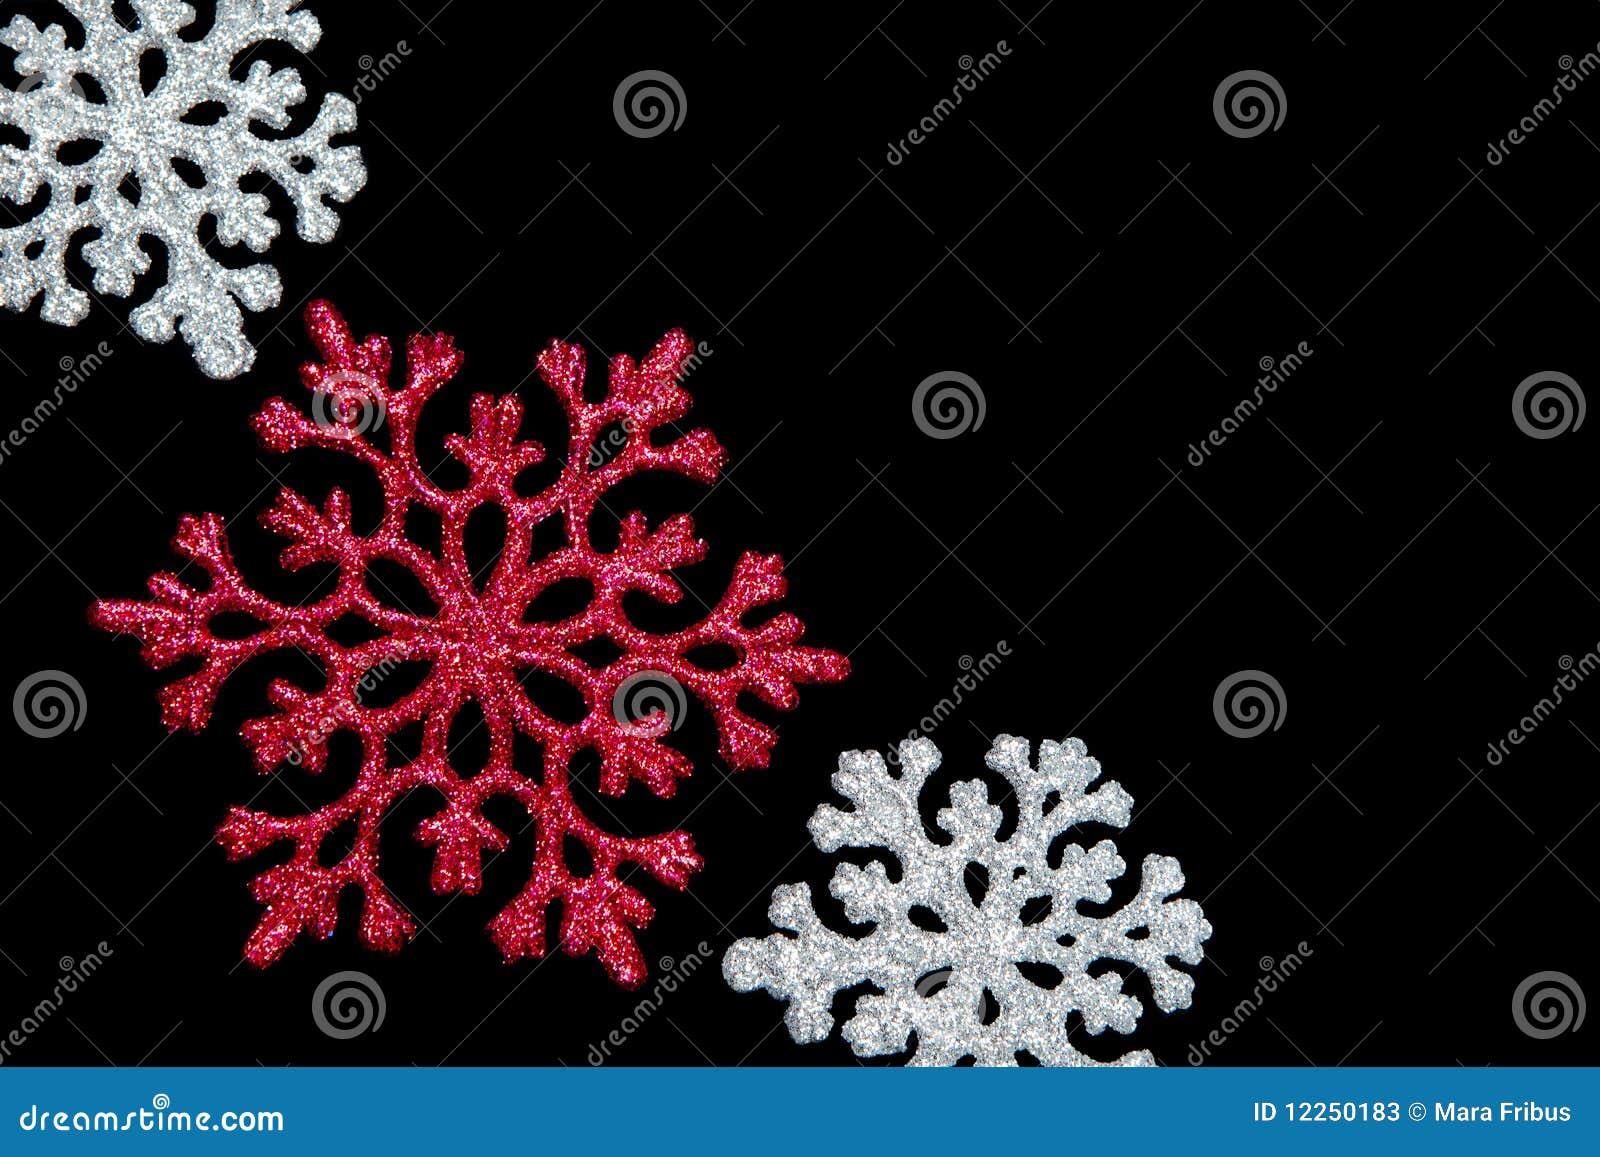 Snowflakes on black